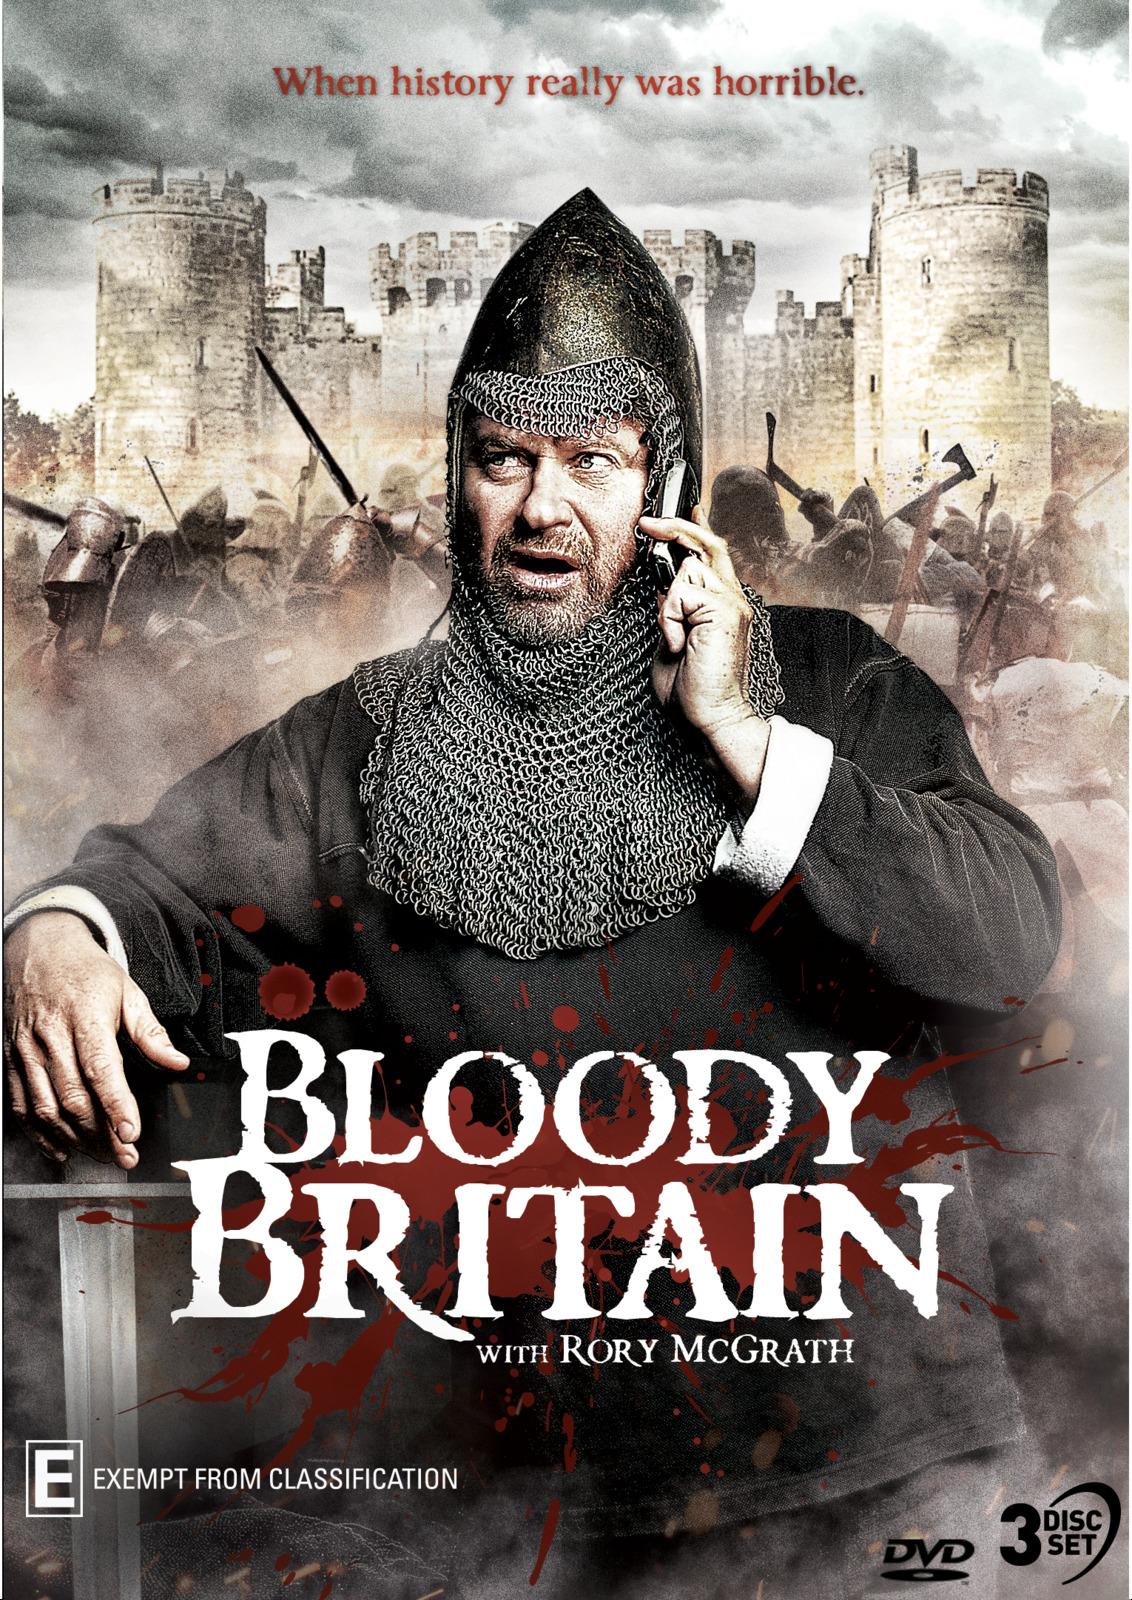 Bloody Britain image